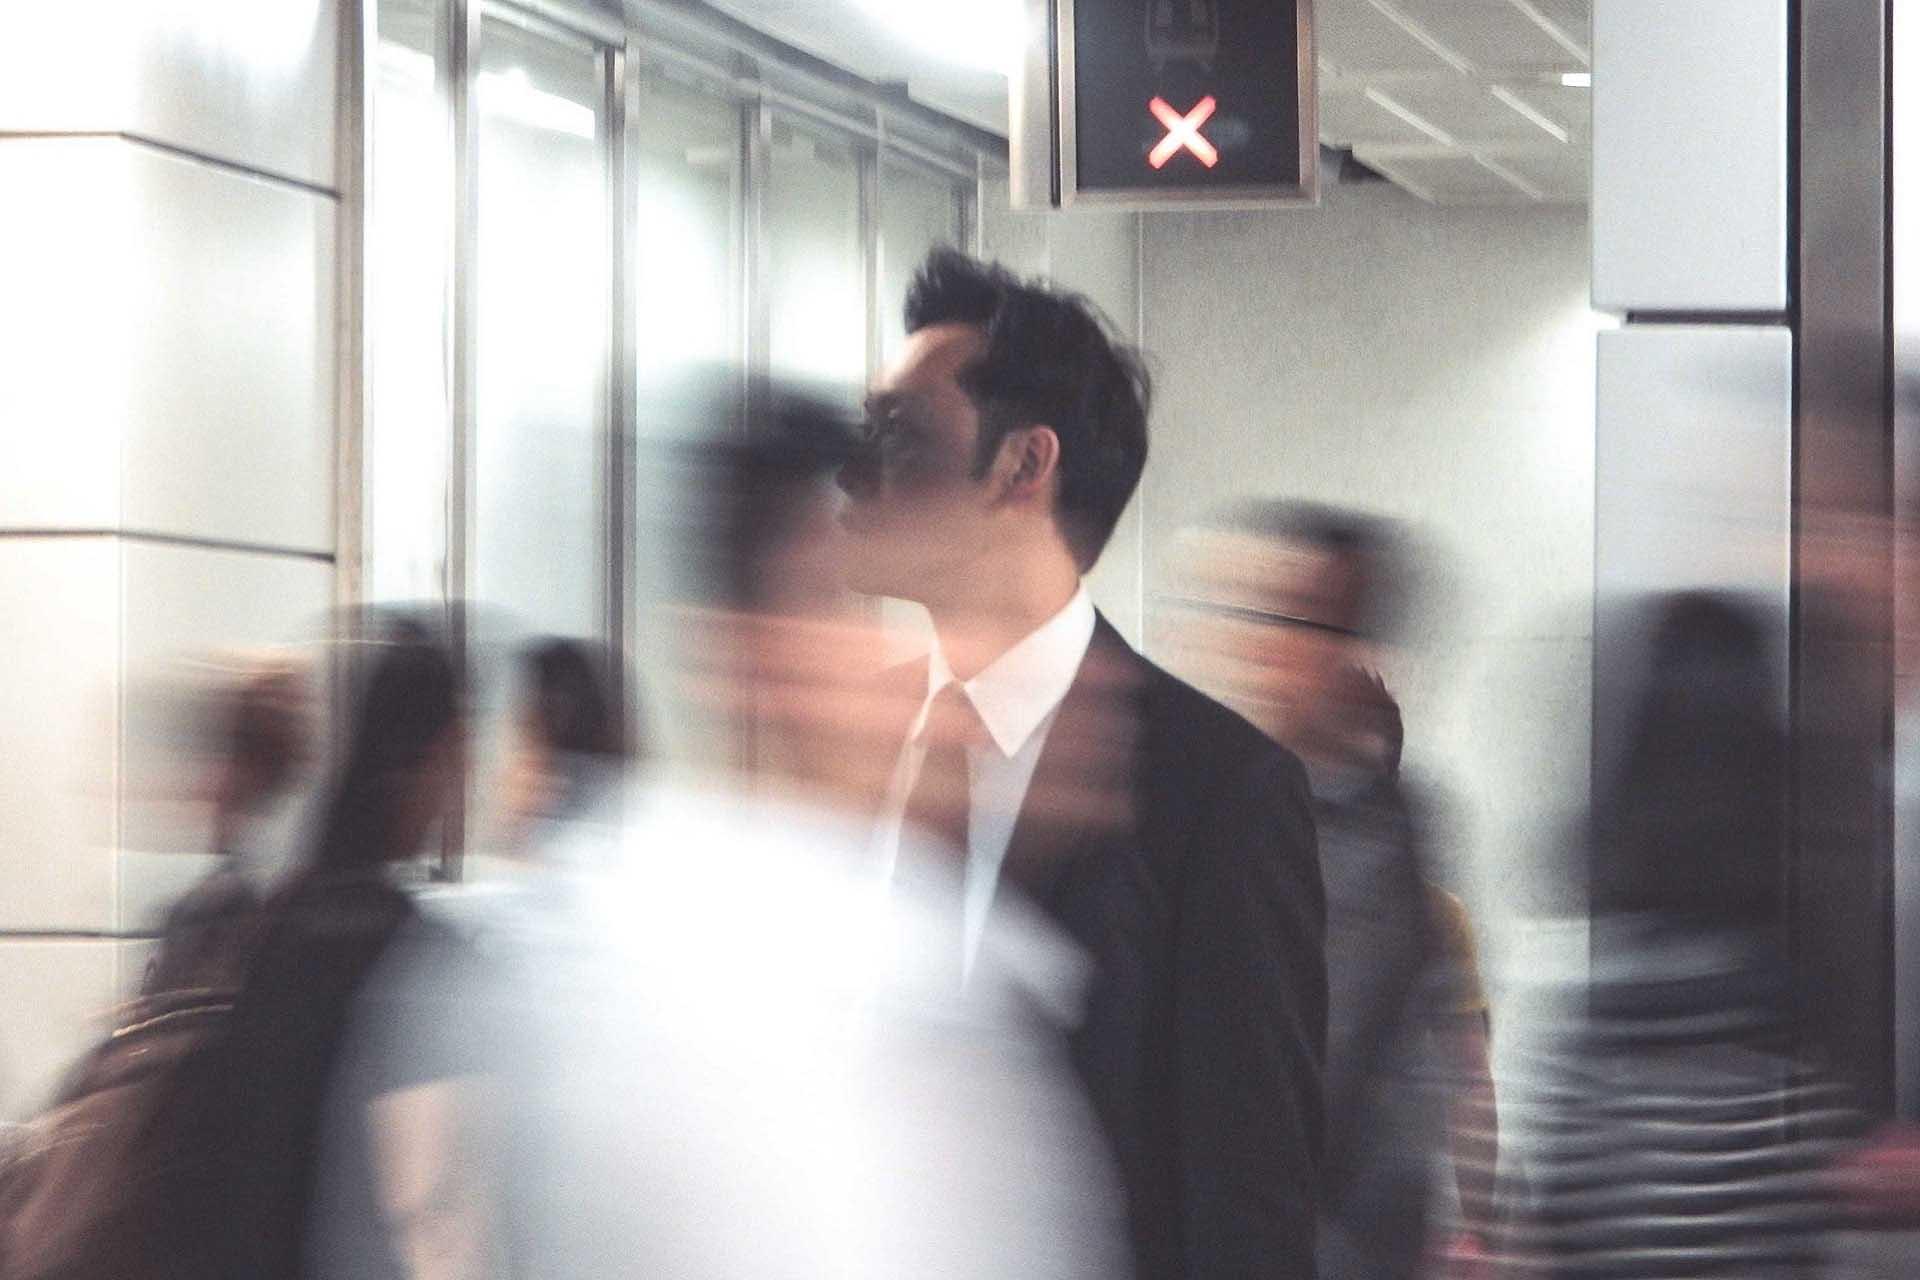 t2informatik Blog: The agile label fraud